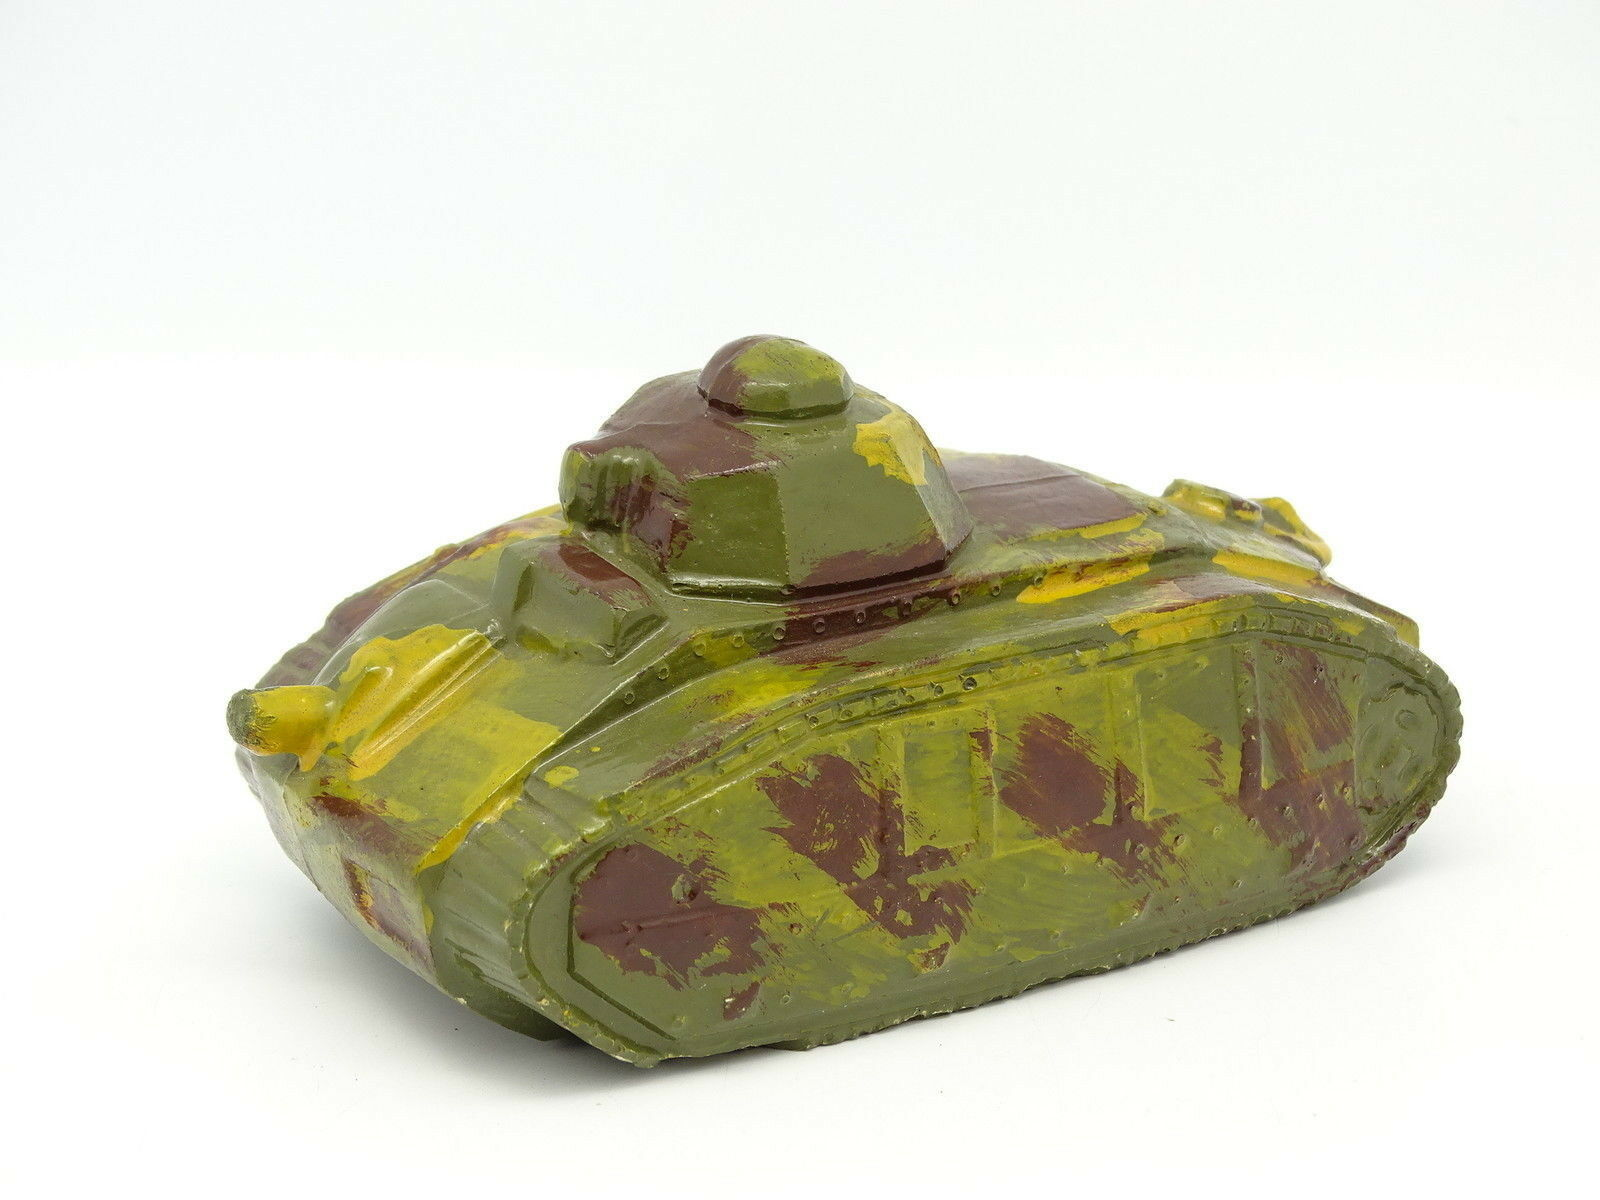 Diversas monterrey y harina - tanque tank (tanque) renault historischen b1